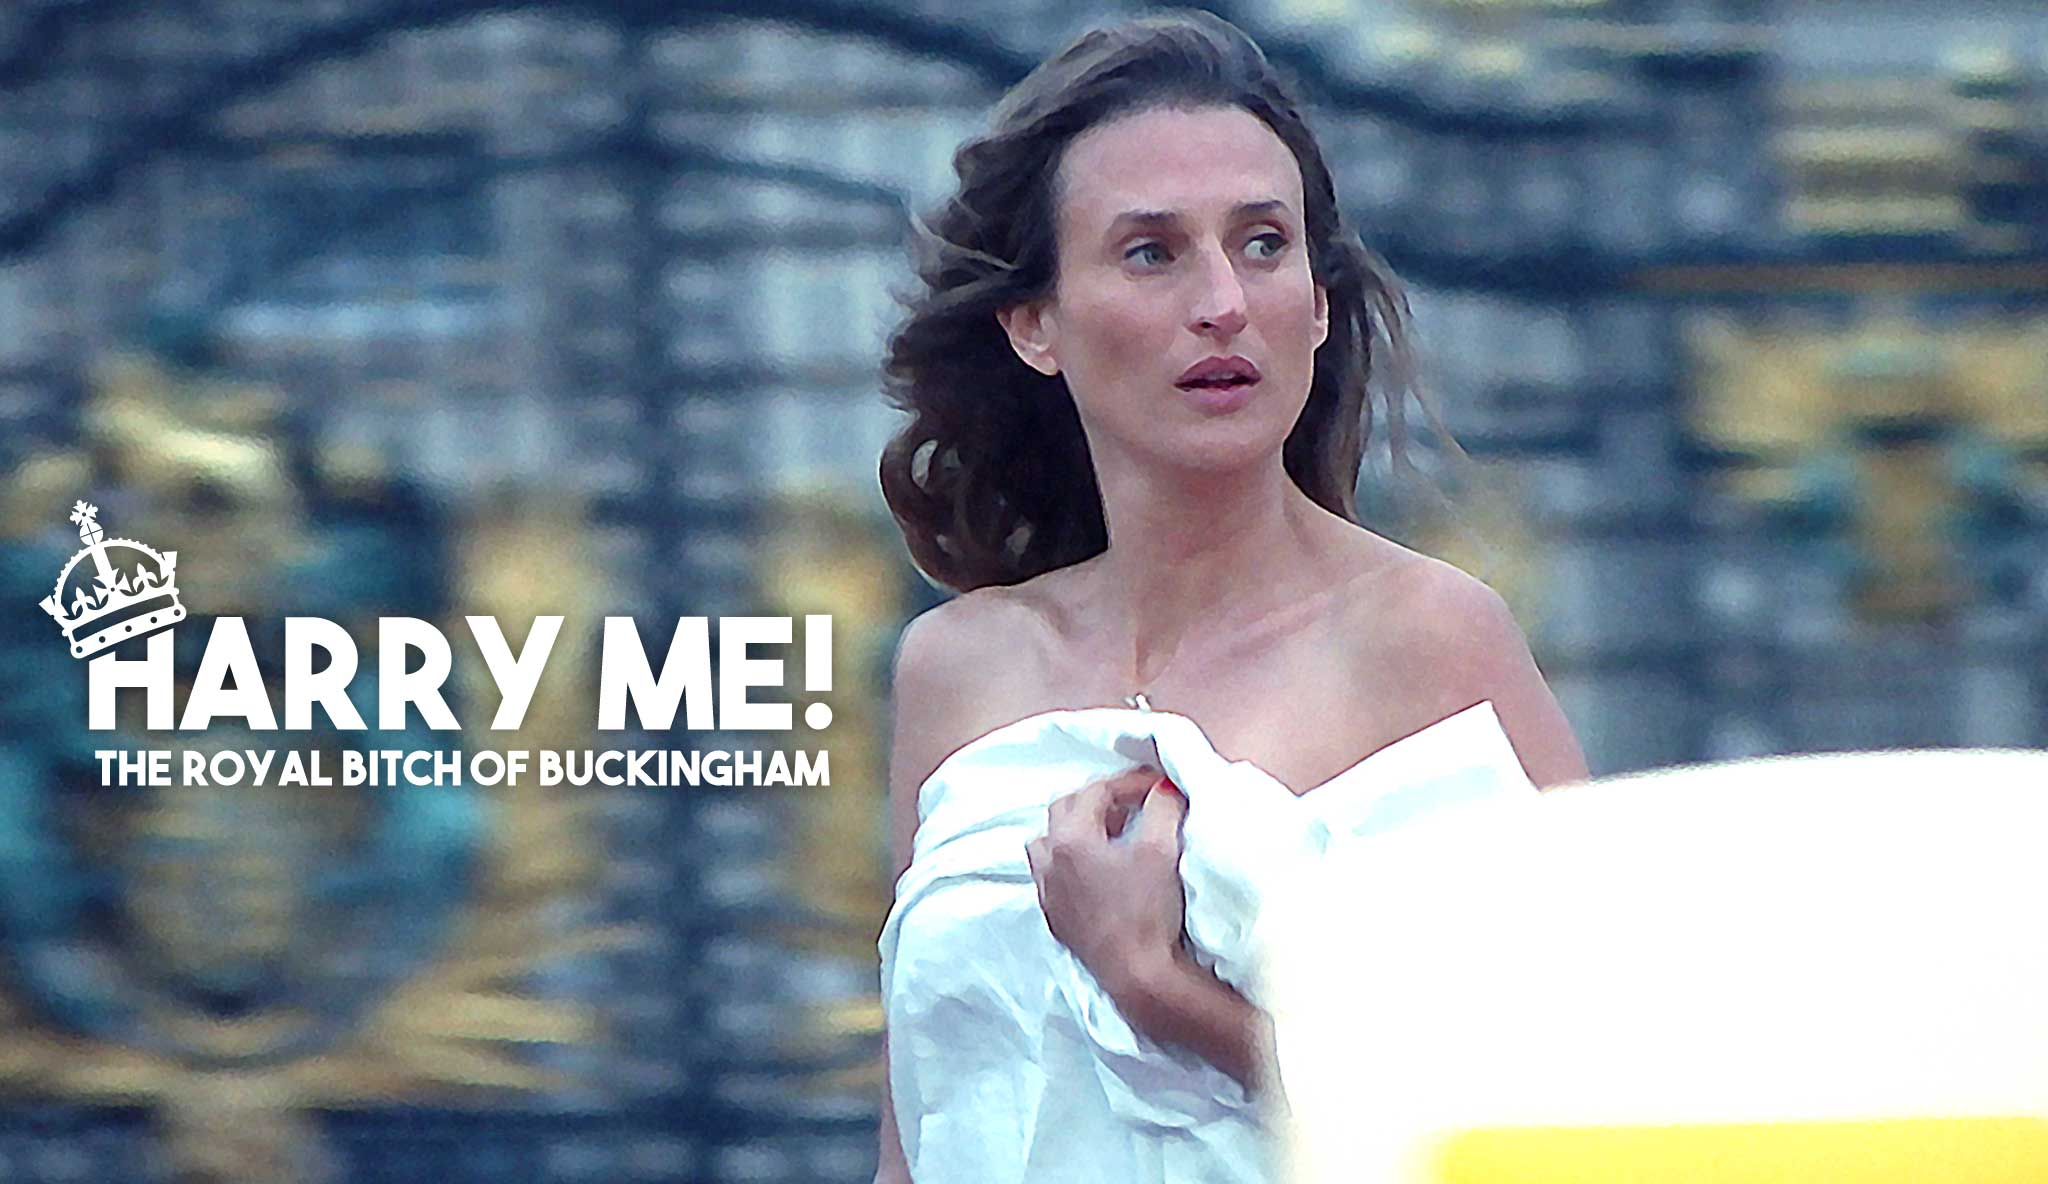 harry-me-the-royal-bitch-of-buckingham\header.jpg